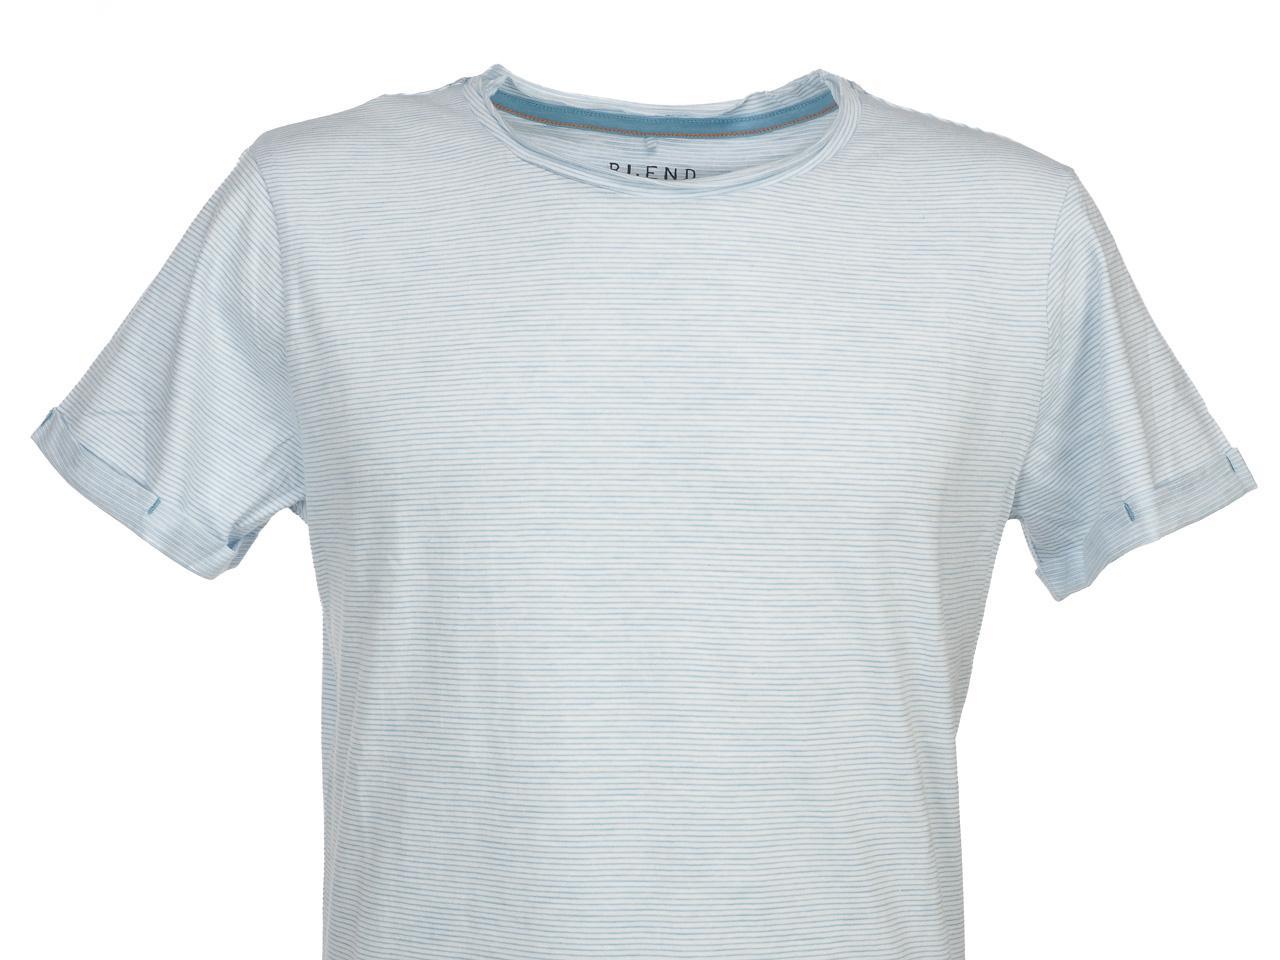 Short-Sleeve-T-Shirt-Blend-Prisco-Steel-Blue-Mc-Tee-Blue-52992-New thumbnail 2